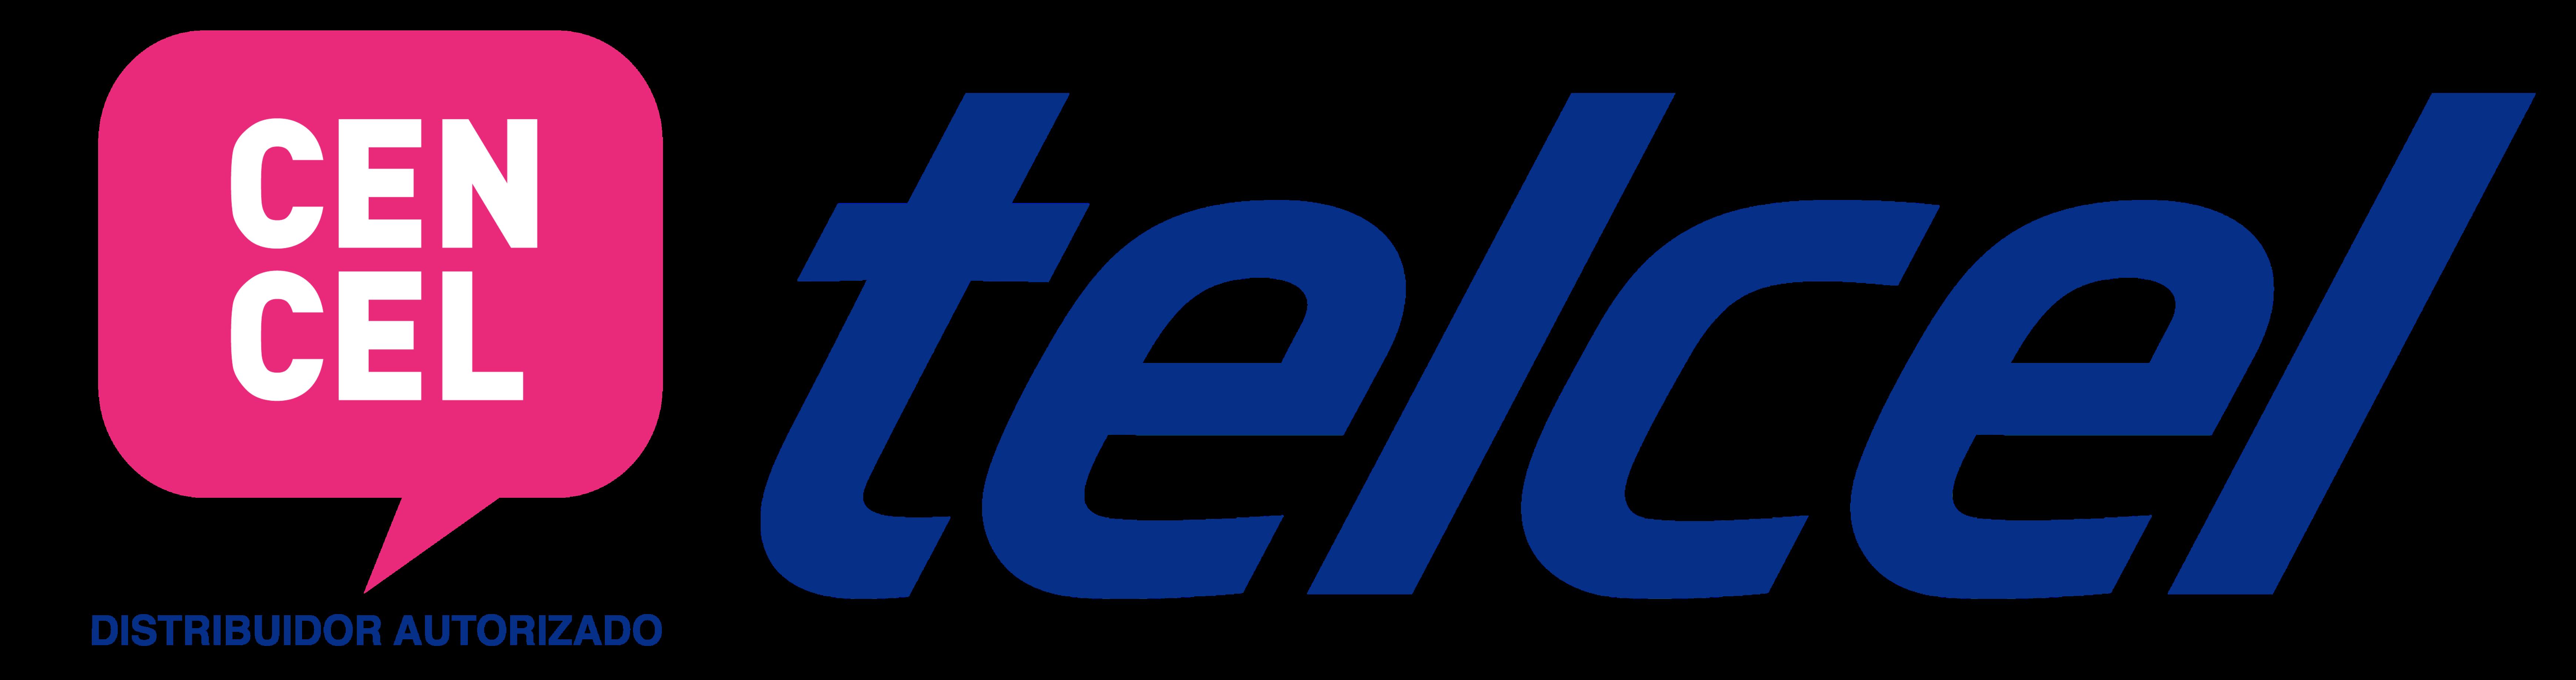 Cencel Logo